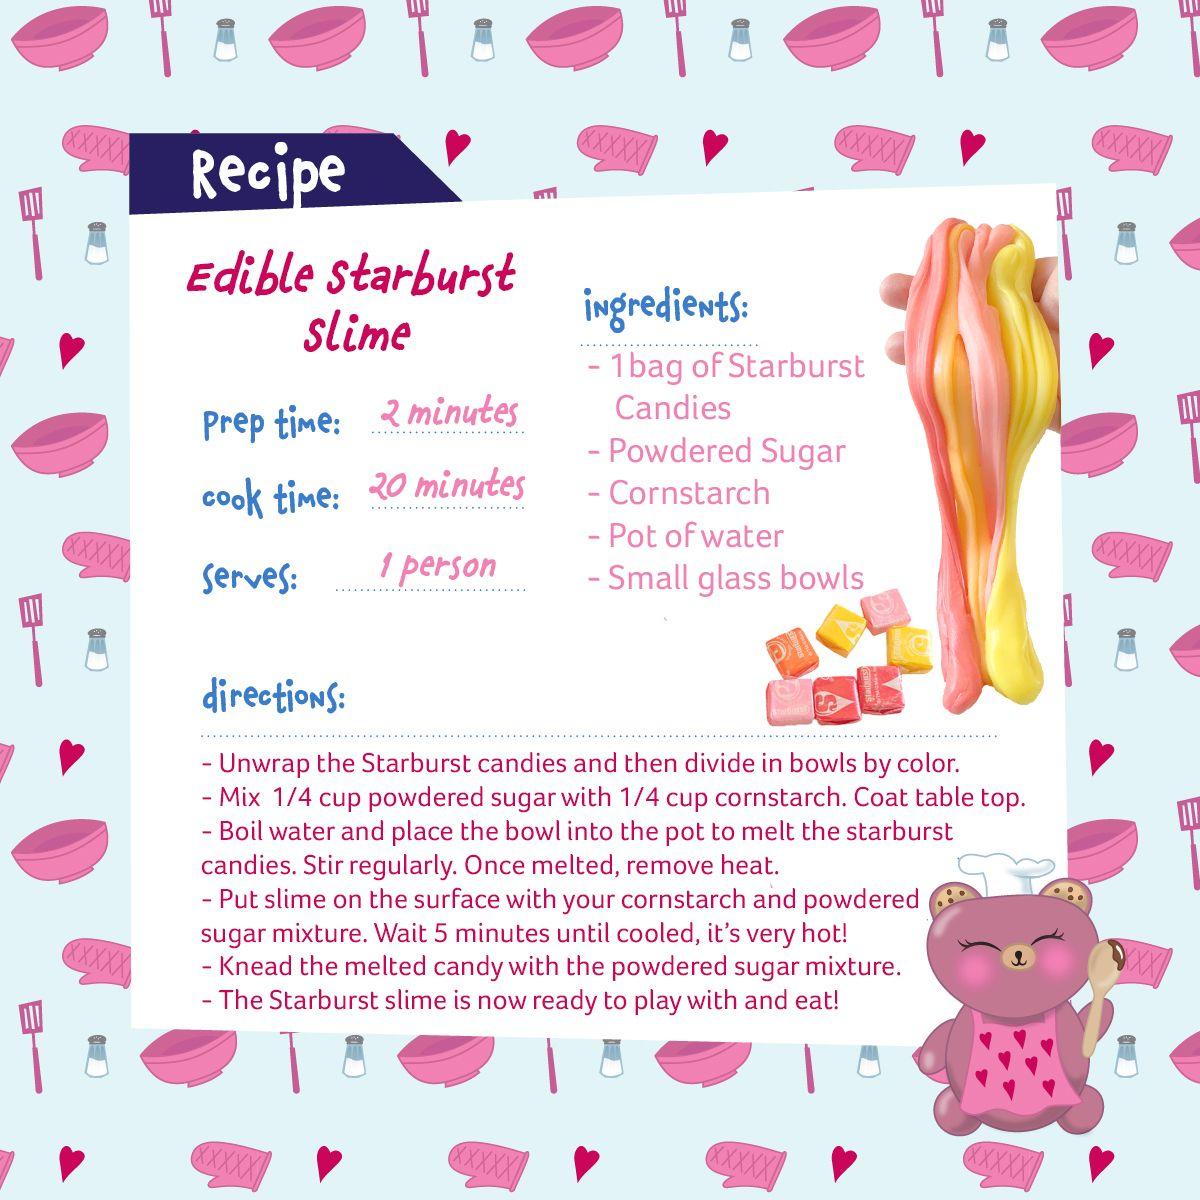 ec6f026261fa Chef Carmins MeBear Recipe! Try this Edible Starburst Slime. Yummy ...